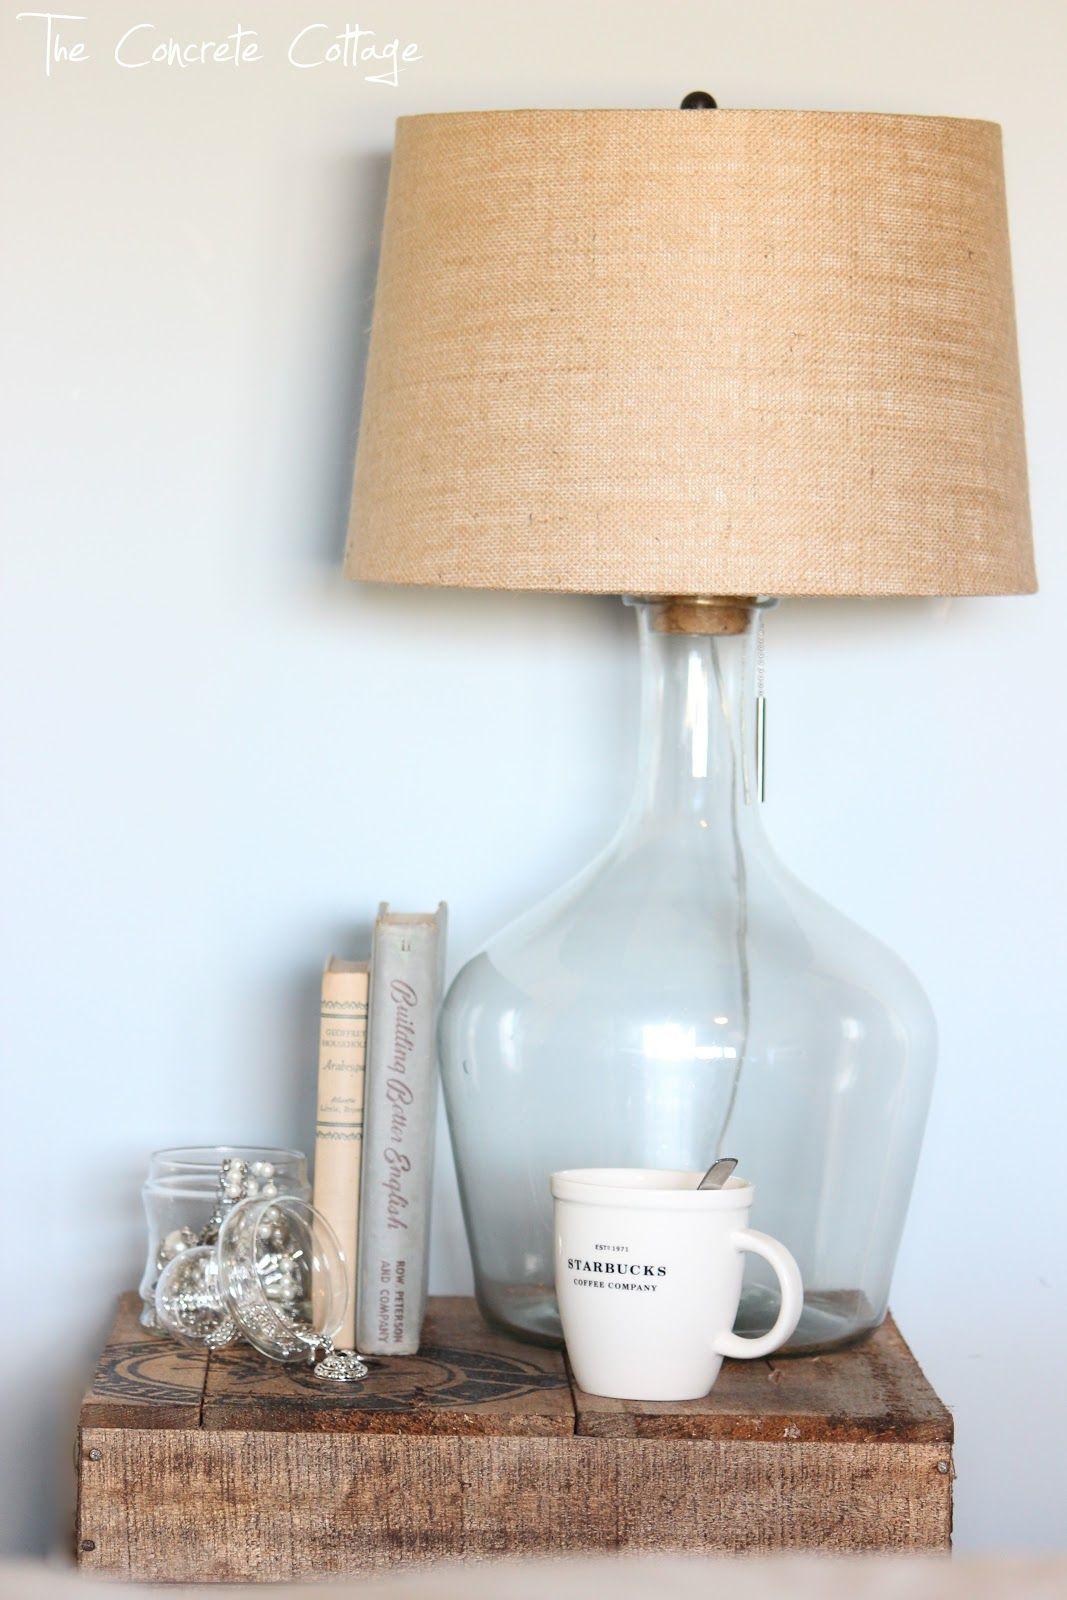 DIY Pottery Barn-Inspired Glass Bottle Lamp, via The Concrete Cottage